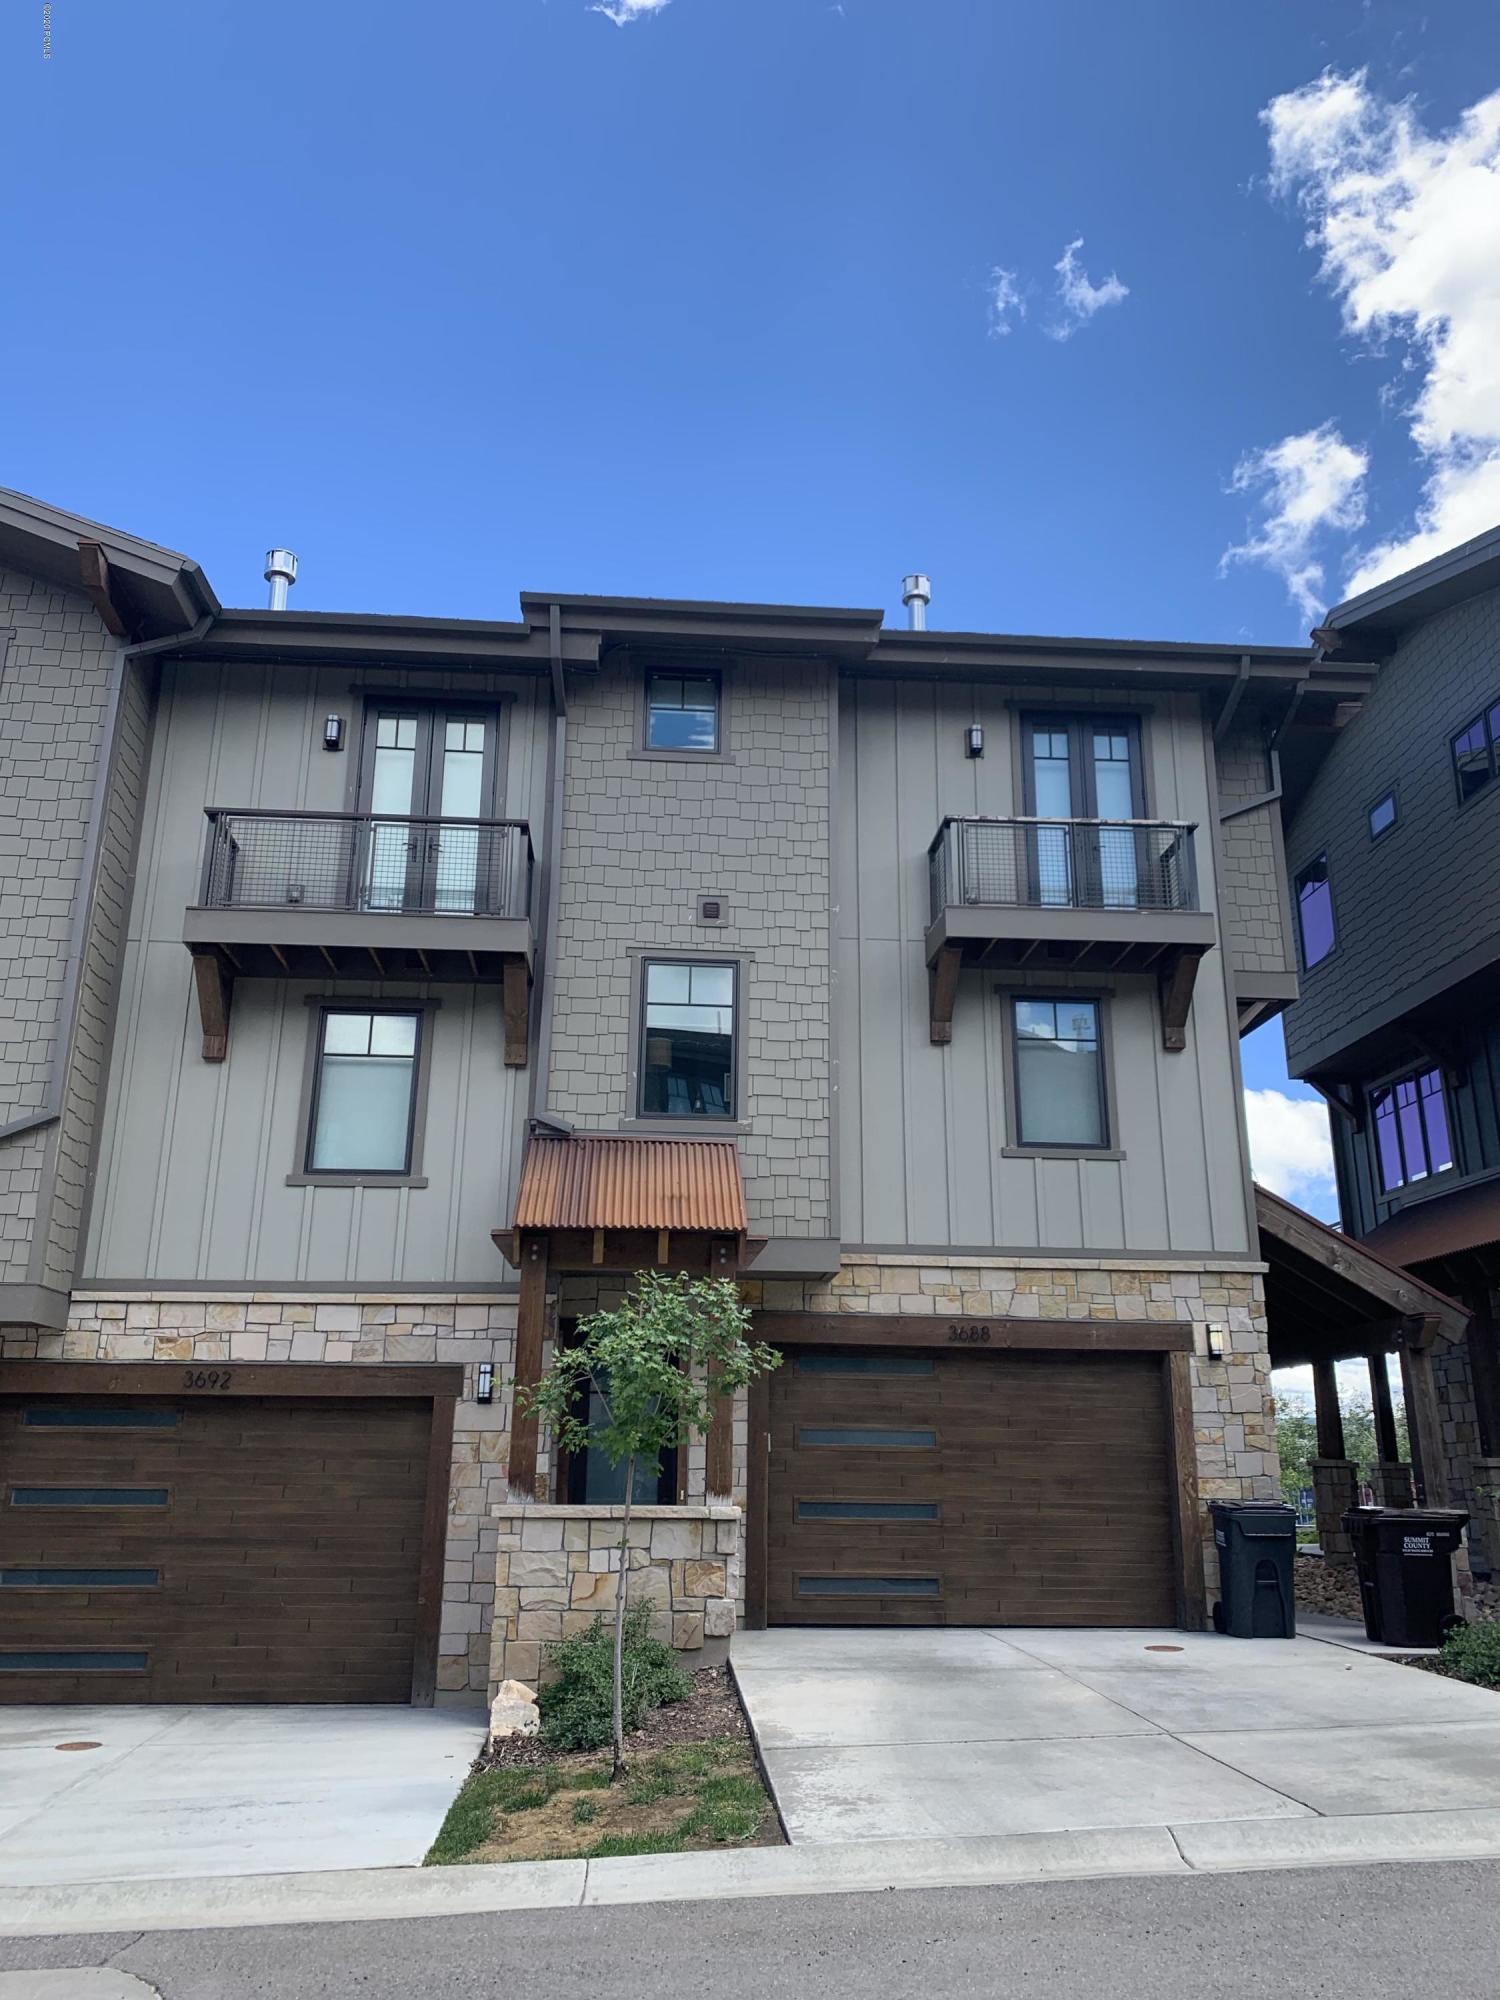 3688 Blackstone Drive, Park City, Utah 84098, 3 Bedrooms Bedrooms, ,3 BathroomsBathrooms,Condominium,For Sale,Blackstone,20190109112430415765000000